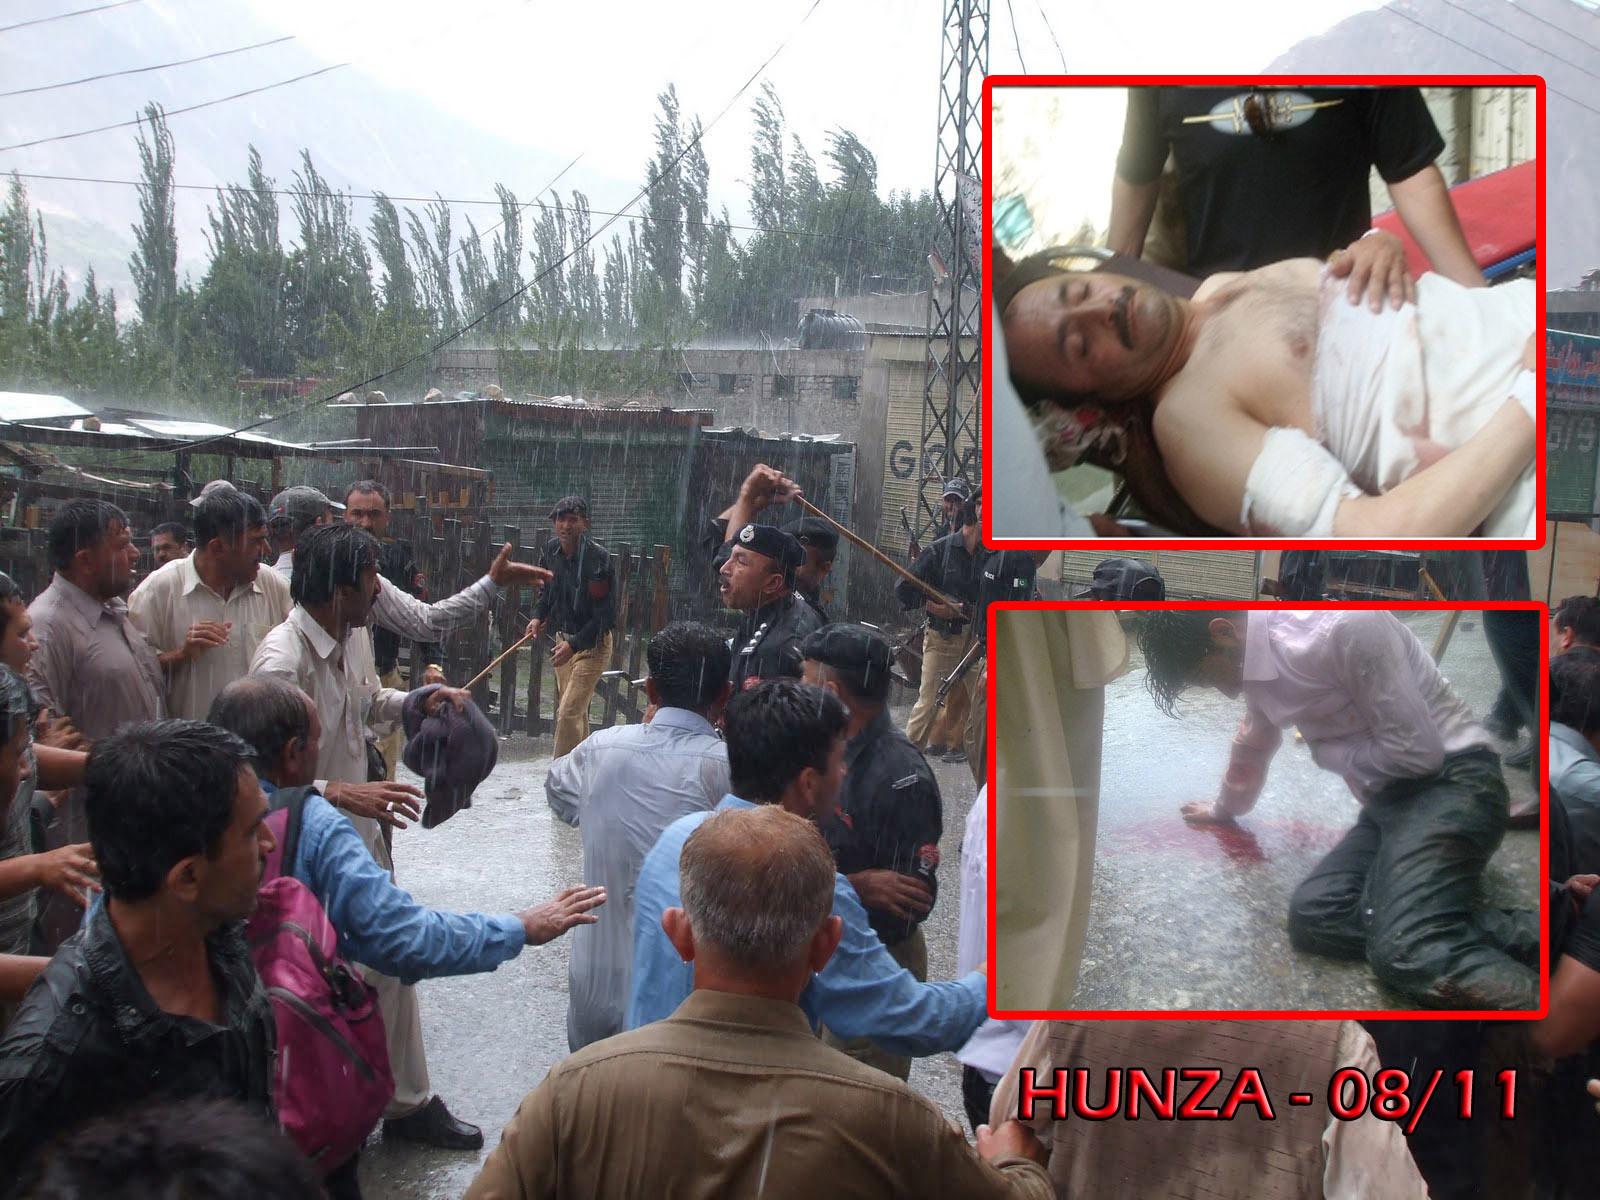 Gilgit: Anti Terrorism Court sentences 12 people, including Baba Jan, to life in prison